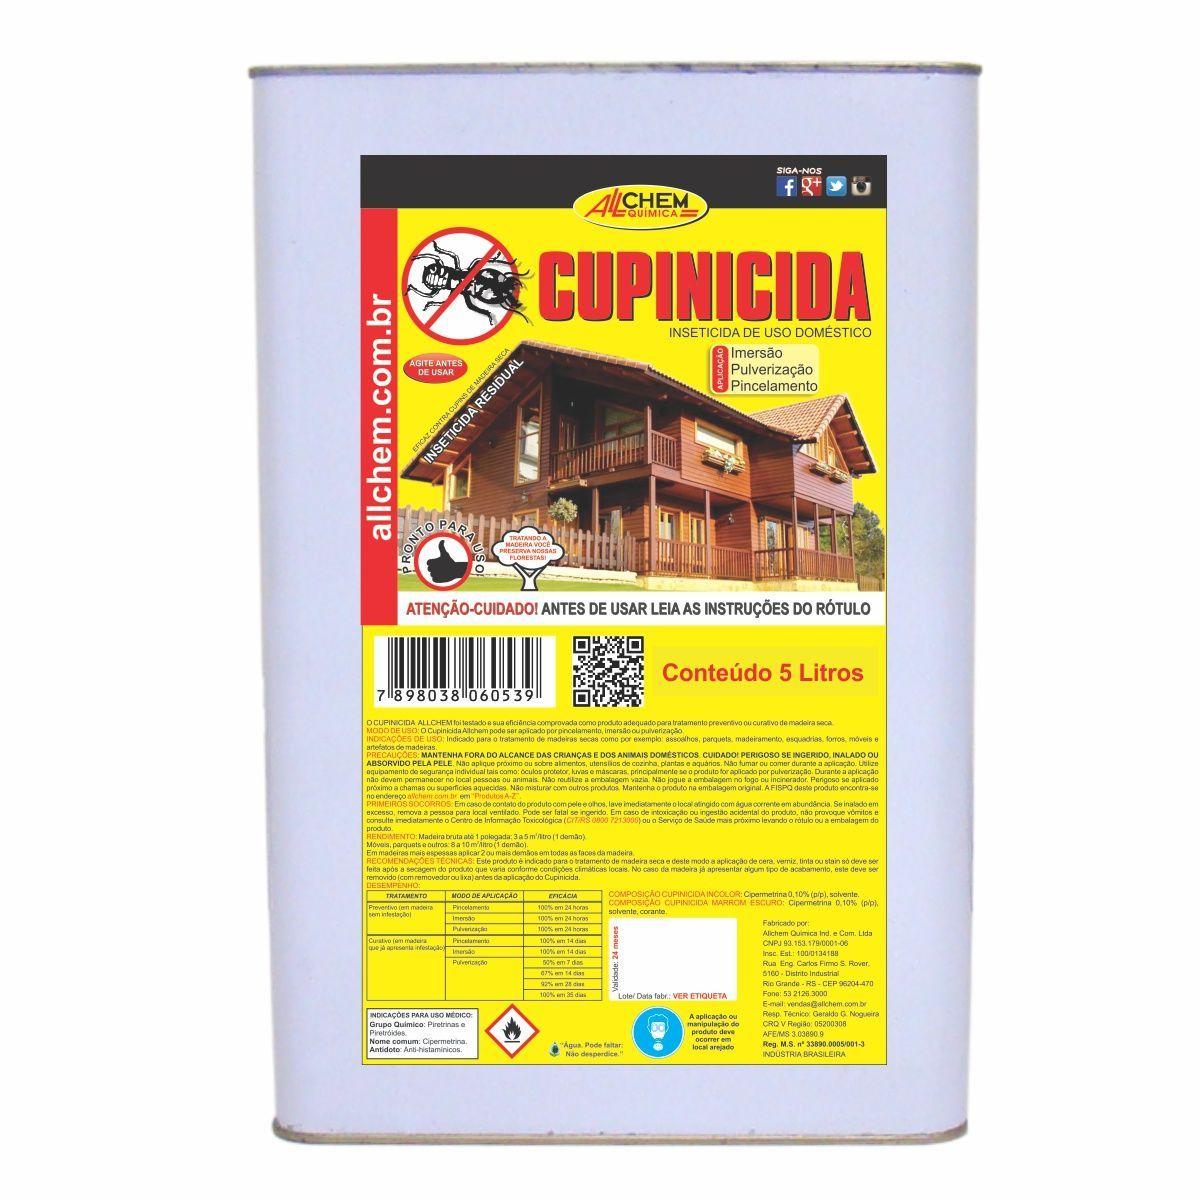 Cupinicida Incolor 2x5 Litros